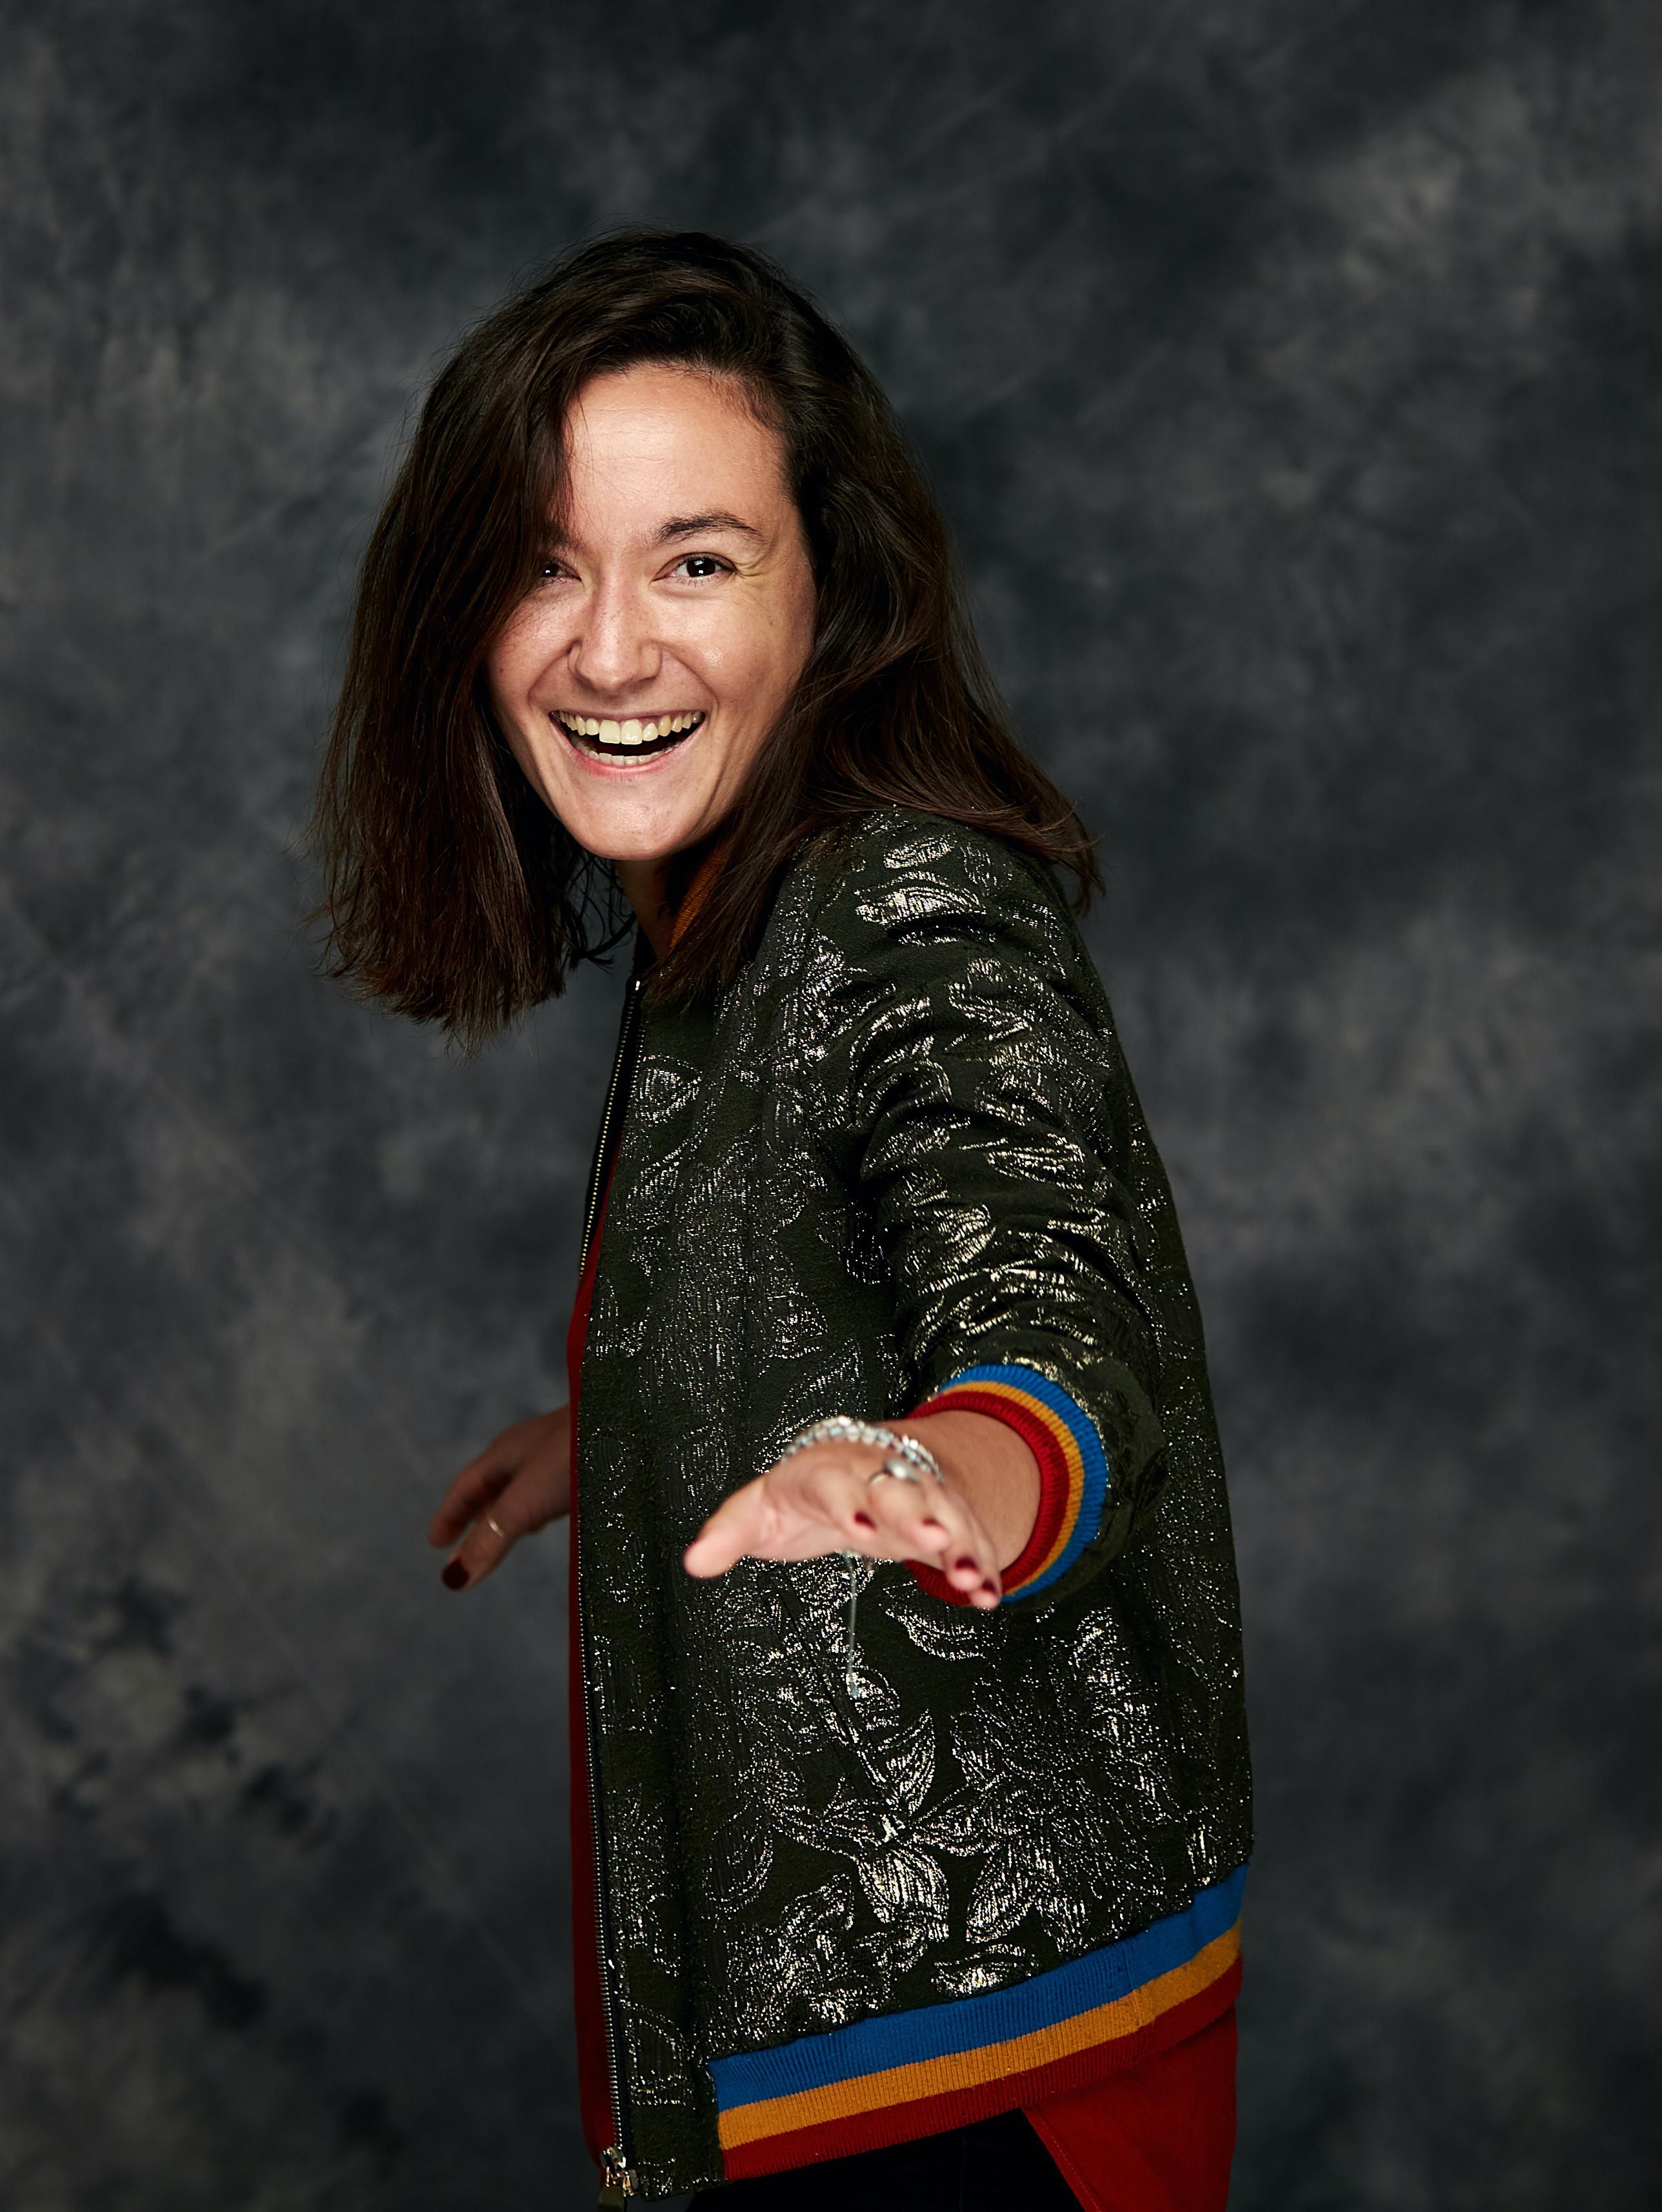 Lucie Ravelojaona